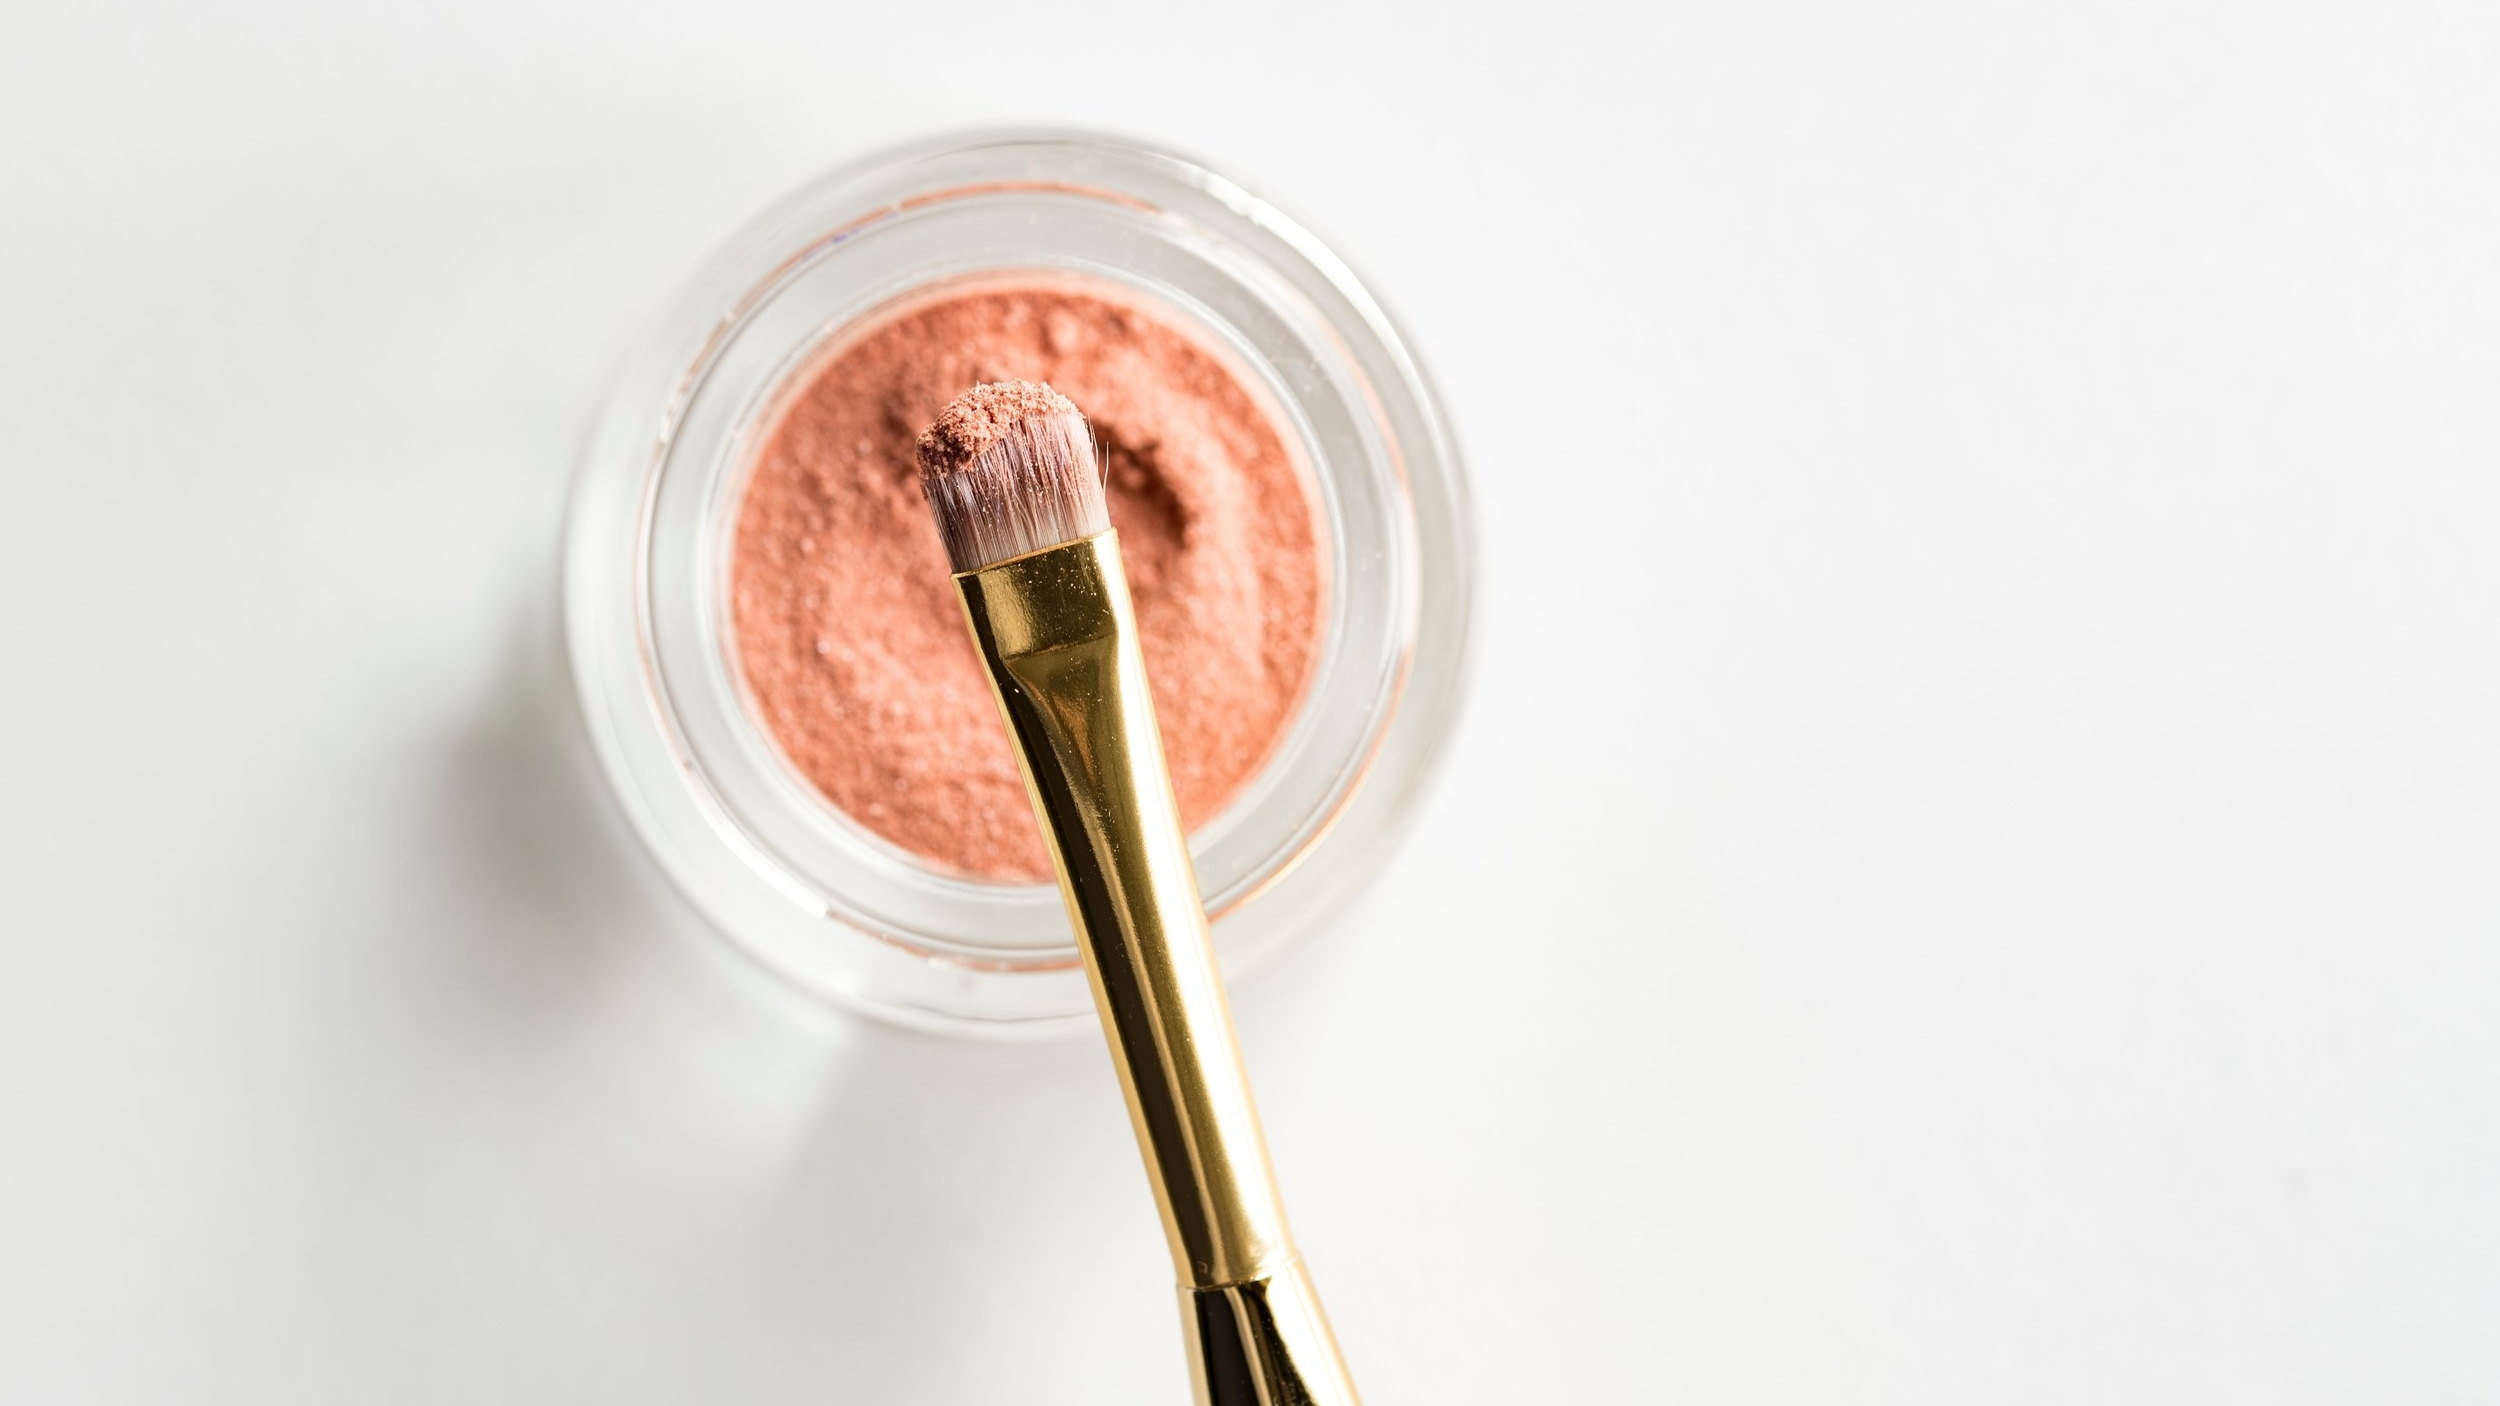 joanna-kosinska-346609-unsplash-makeup.jpg